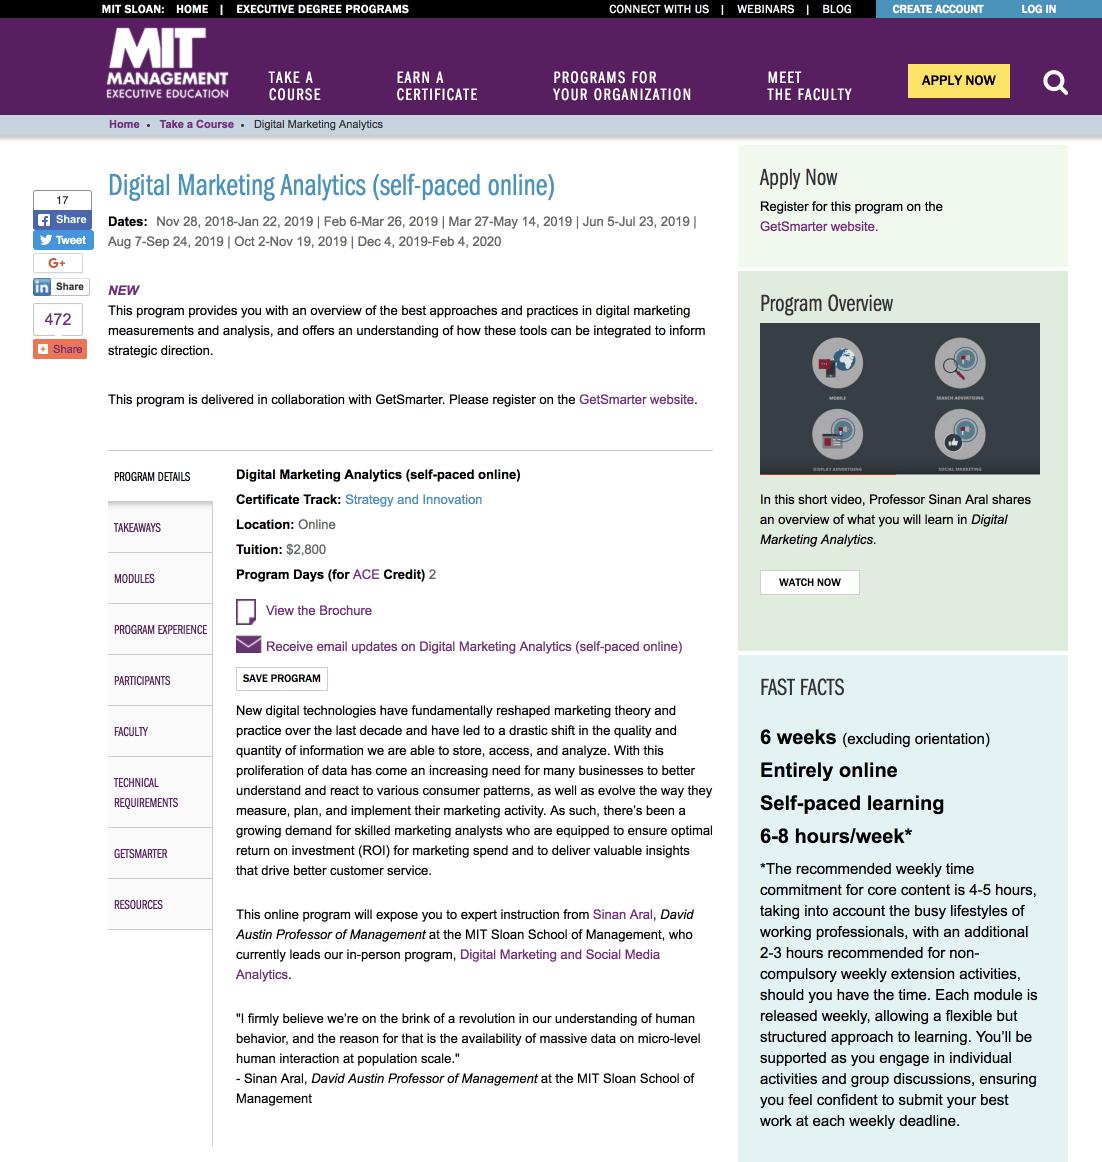 The MIT Digital Marketing Analytics course landing page